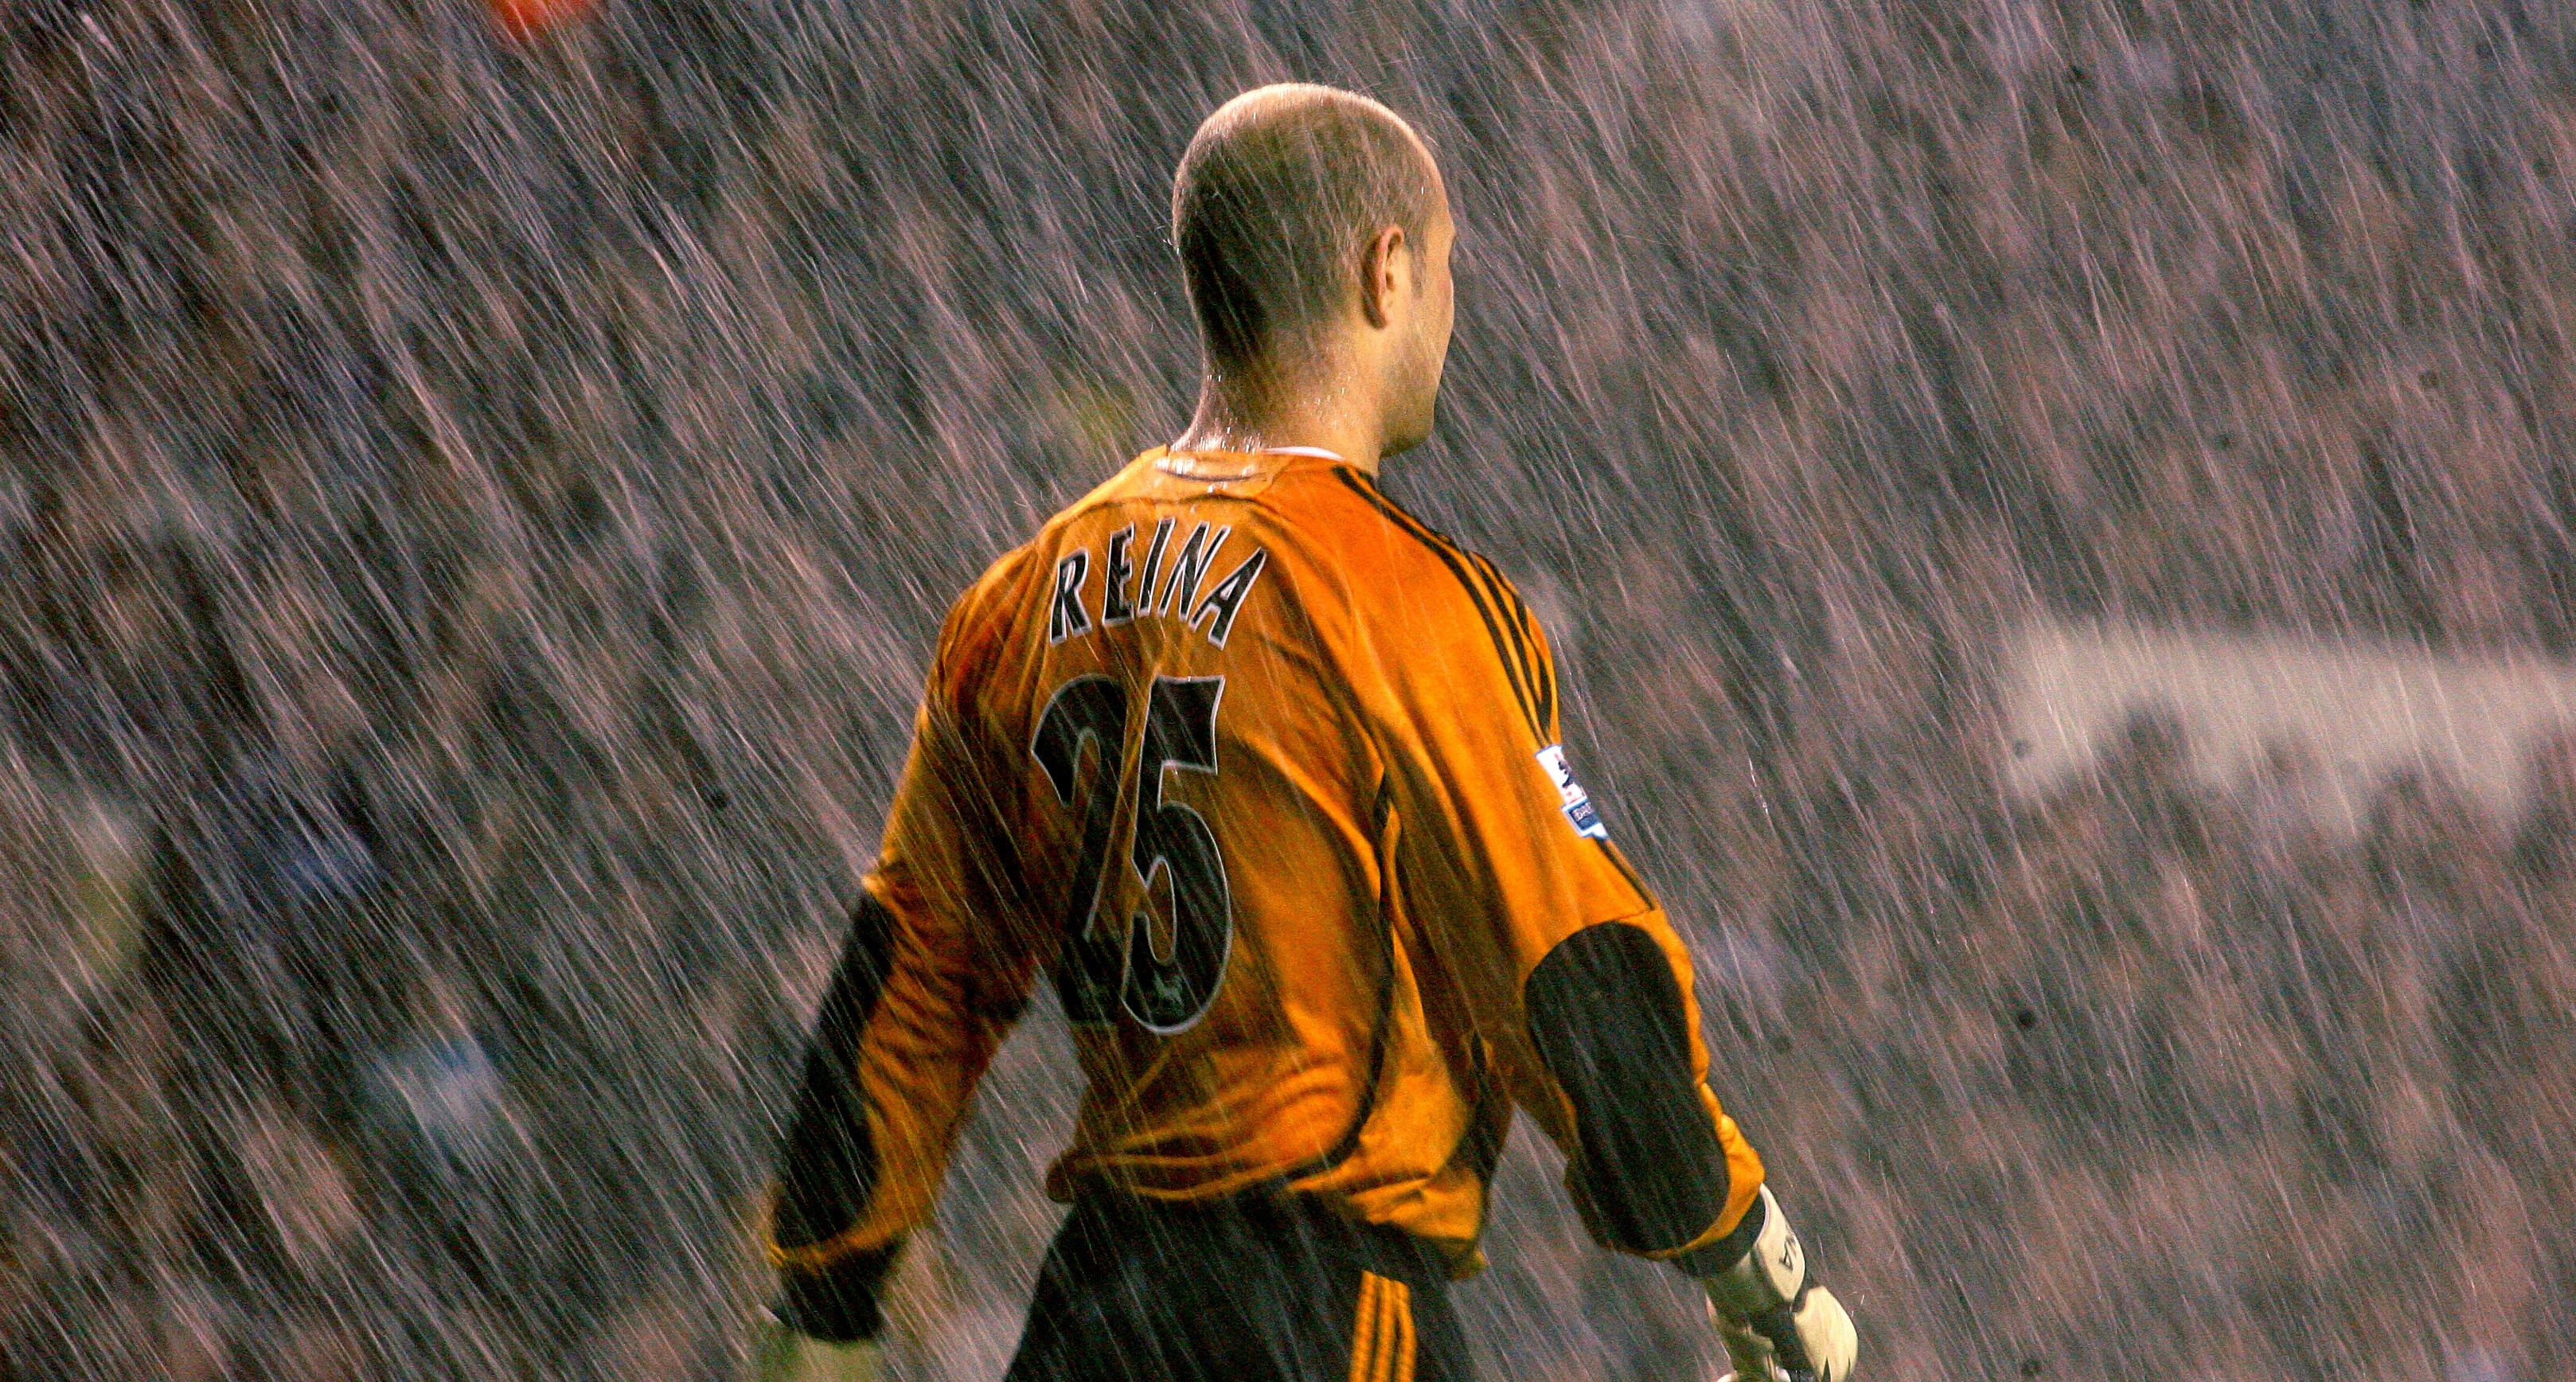 Soccer - FA Barclays Premiership - Tottenham Hotspur v Liverpool - White Hart Lane